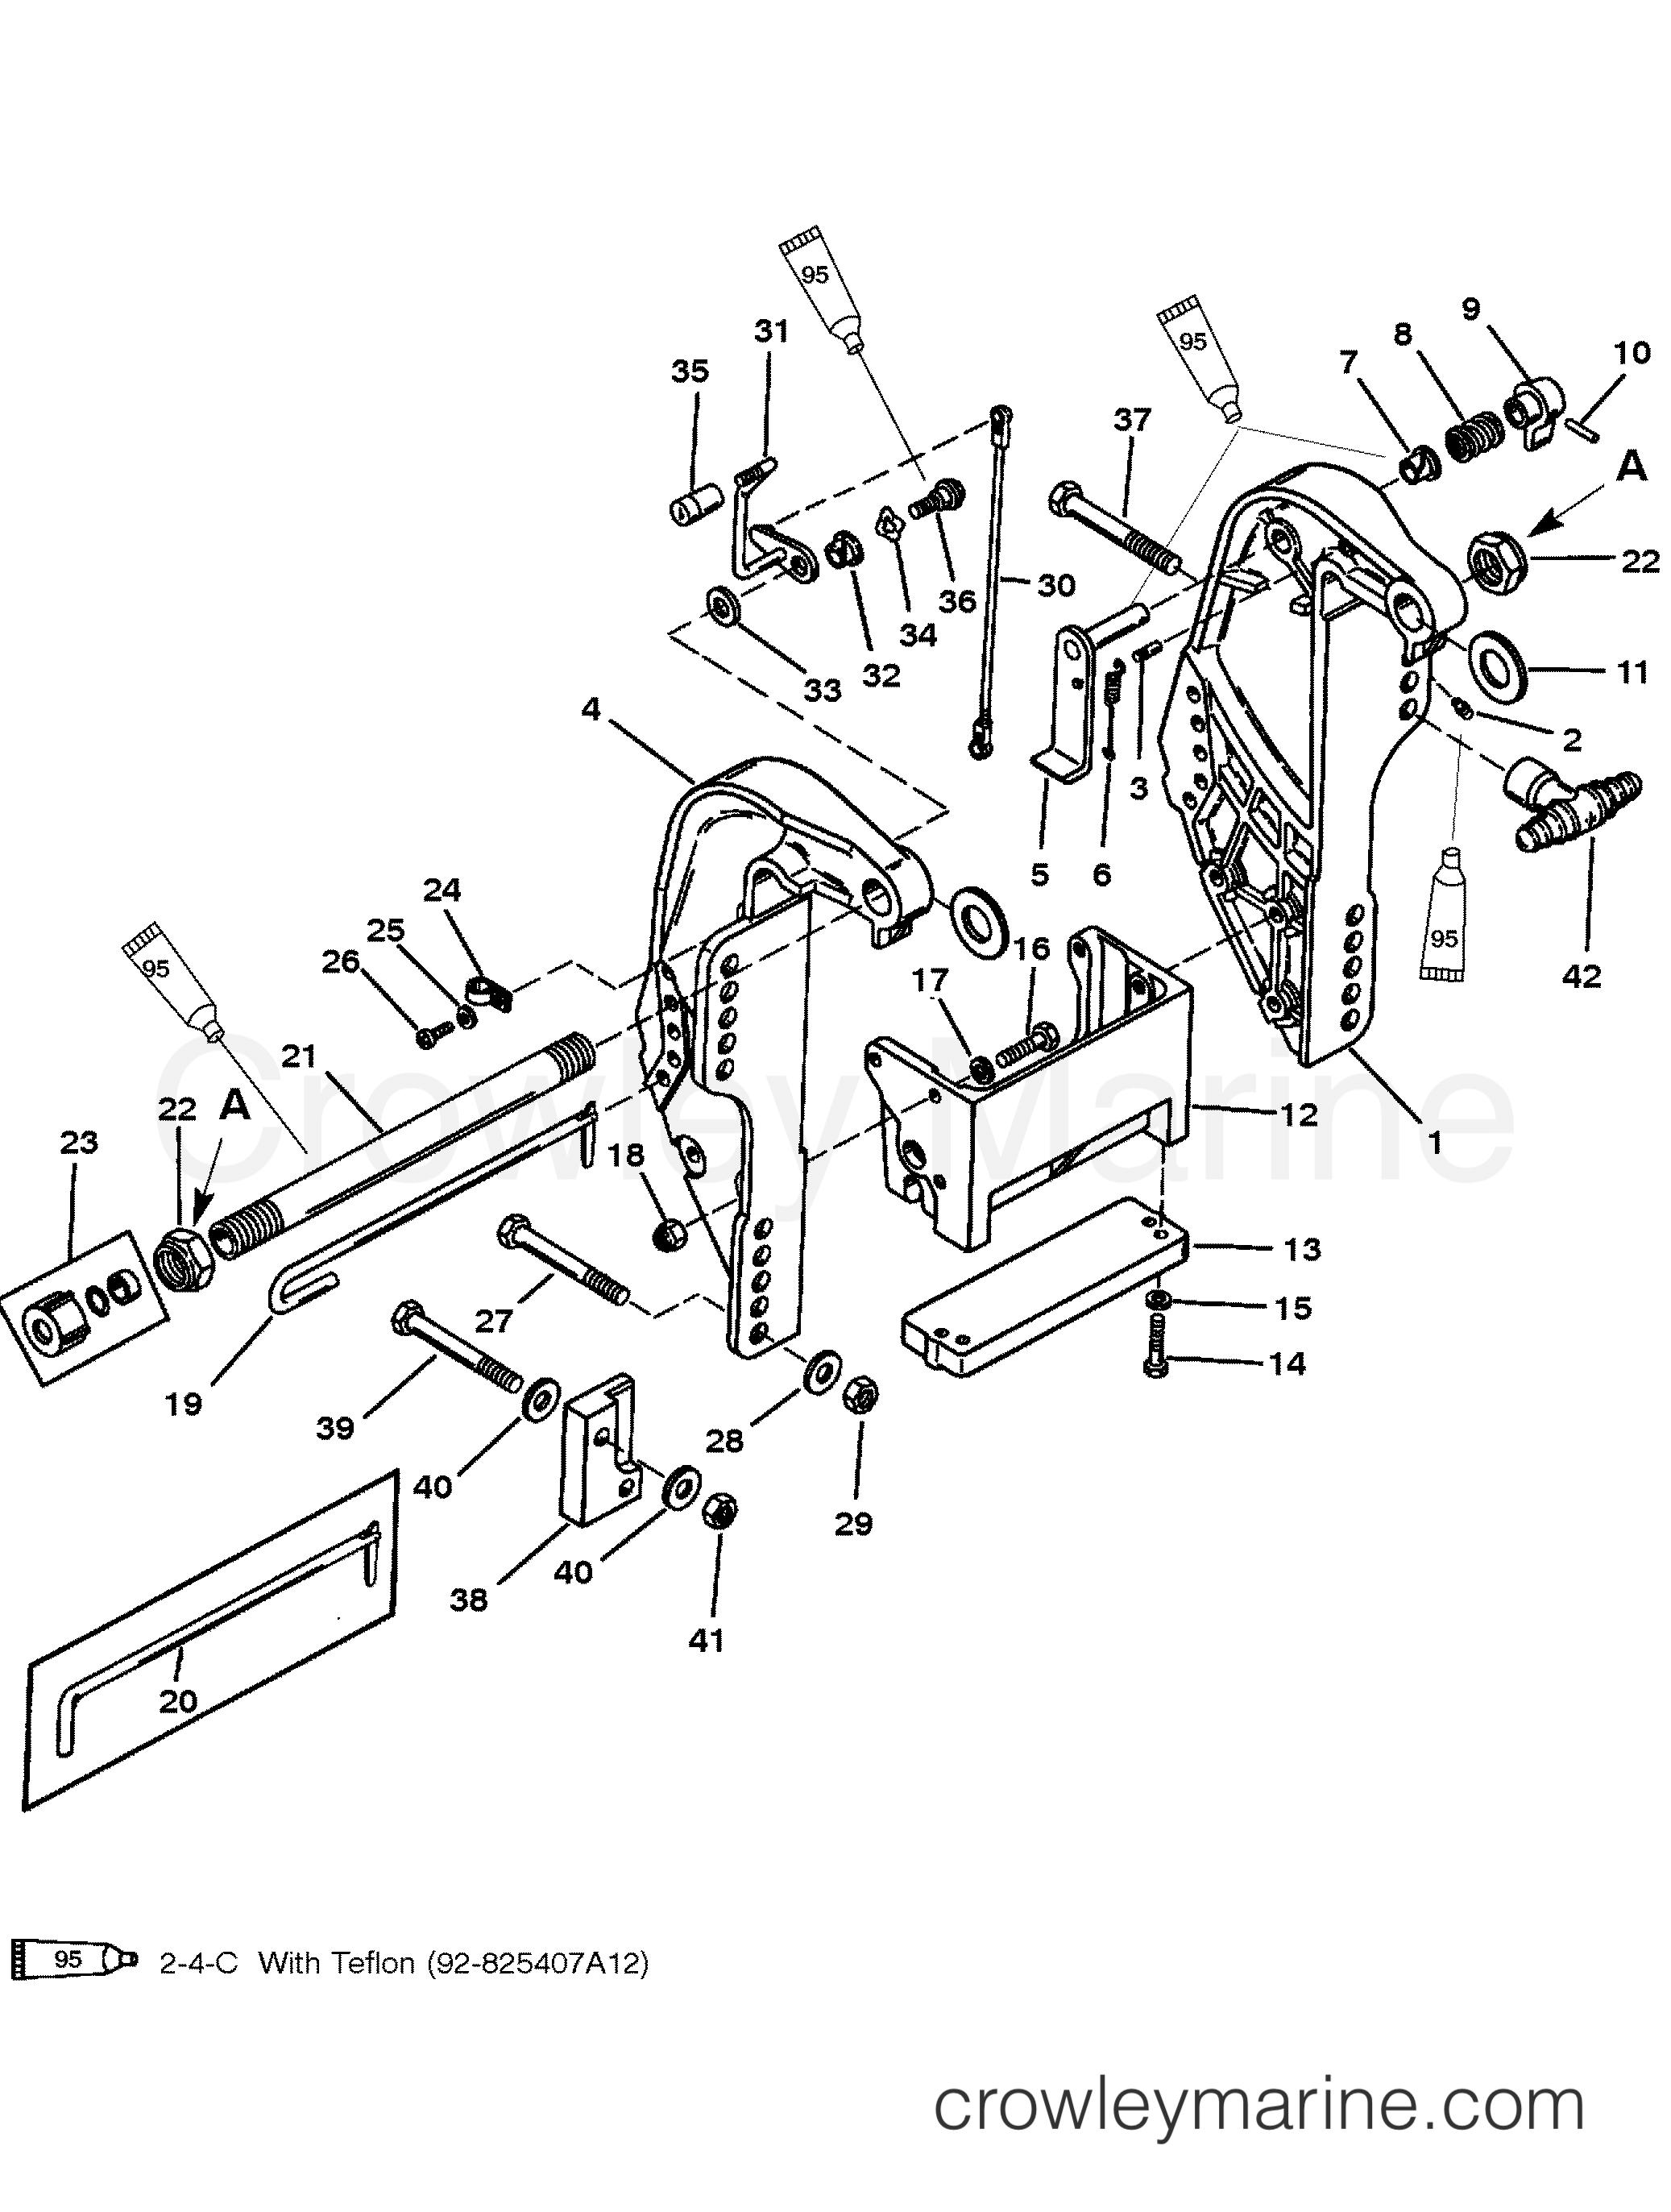 1995 Mercury Outboard 40 [ELPT] - 1040410RB TRANSOM BRACKET (S/N D181999 & BELOW) section